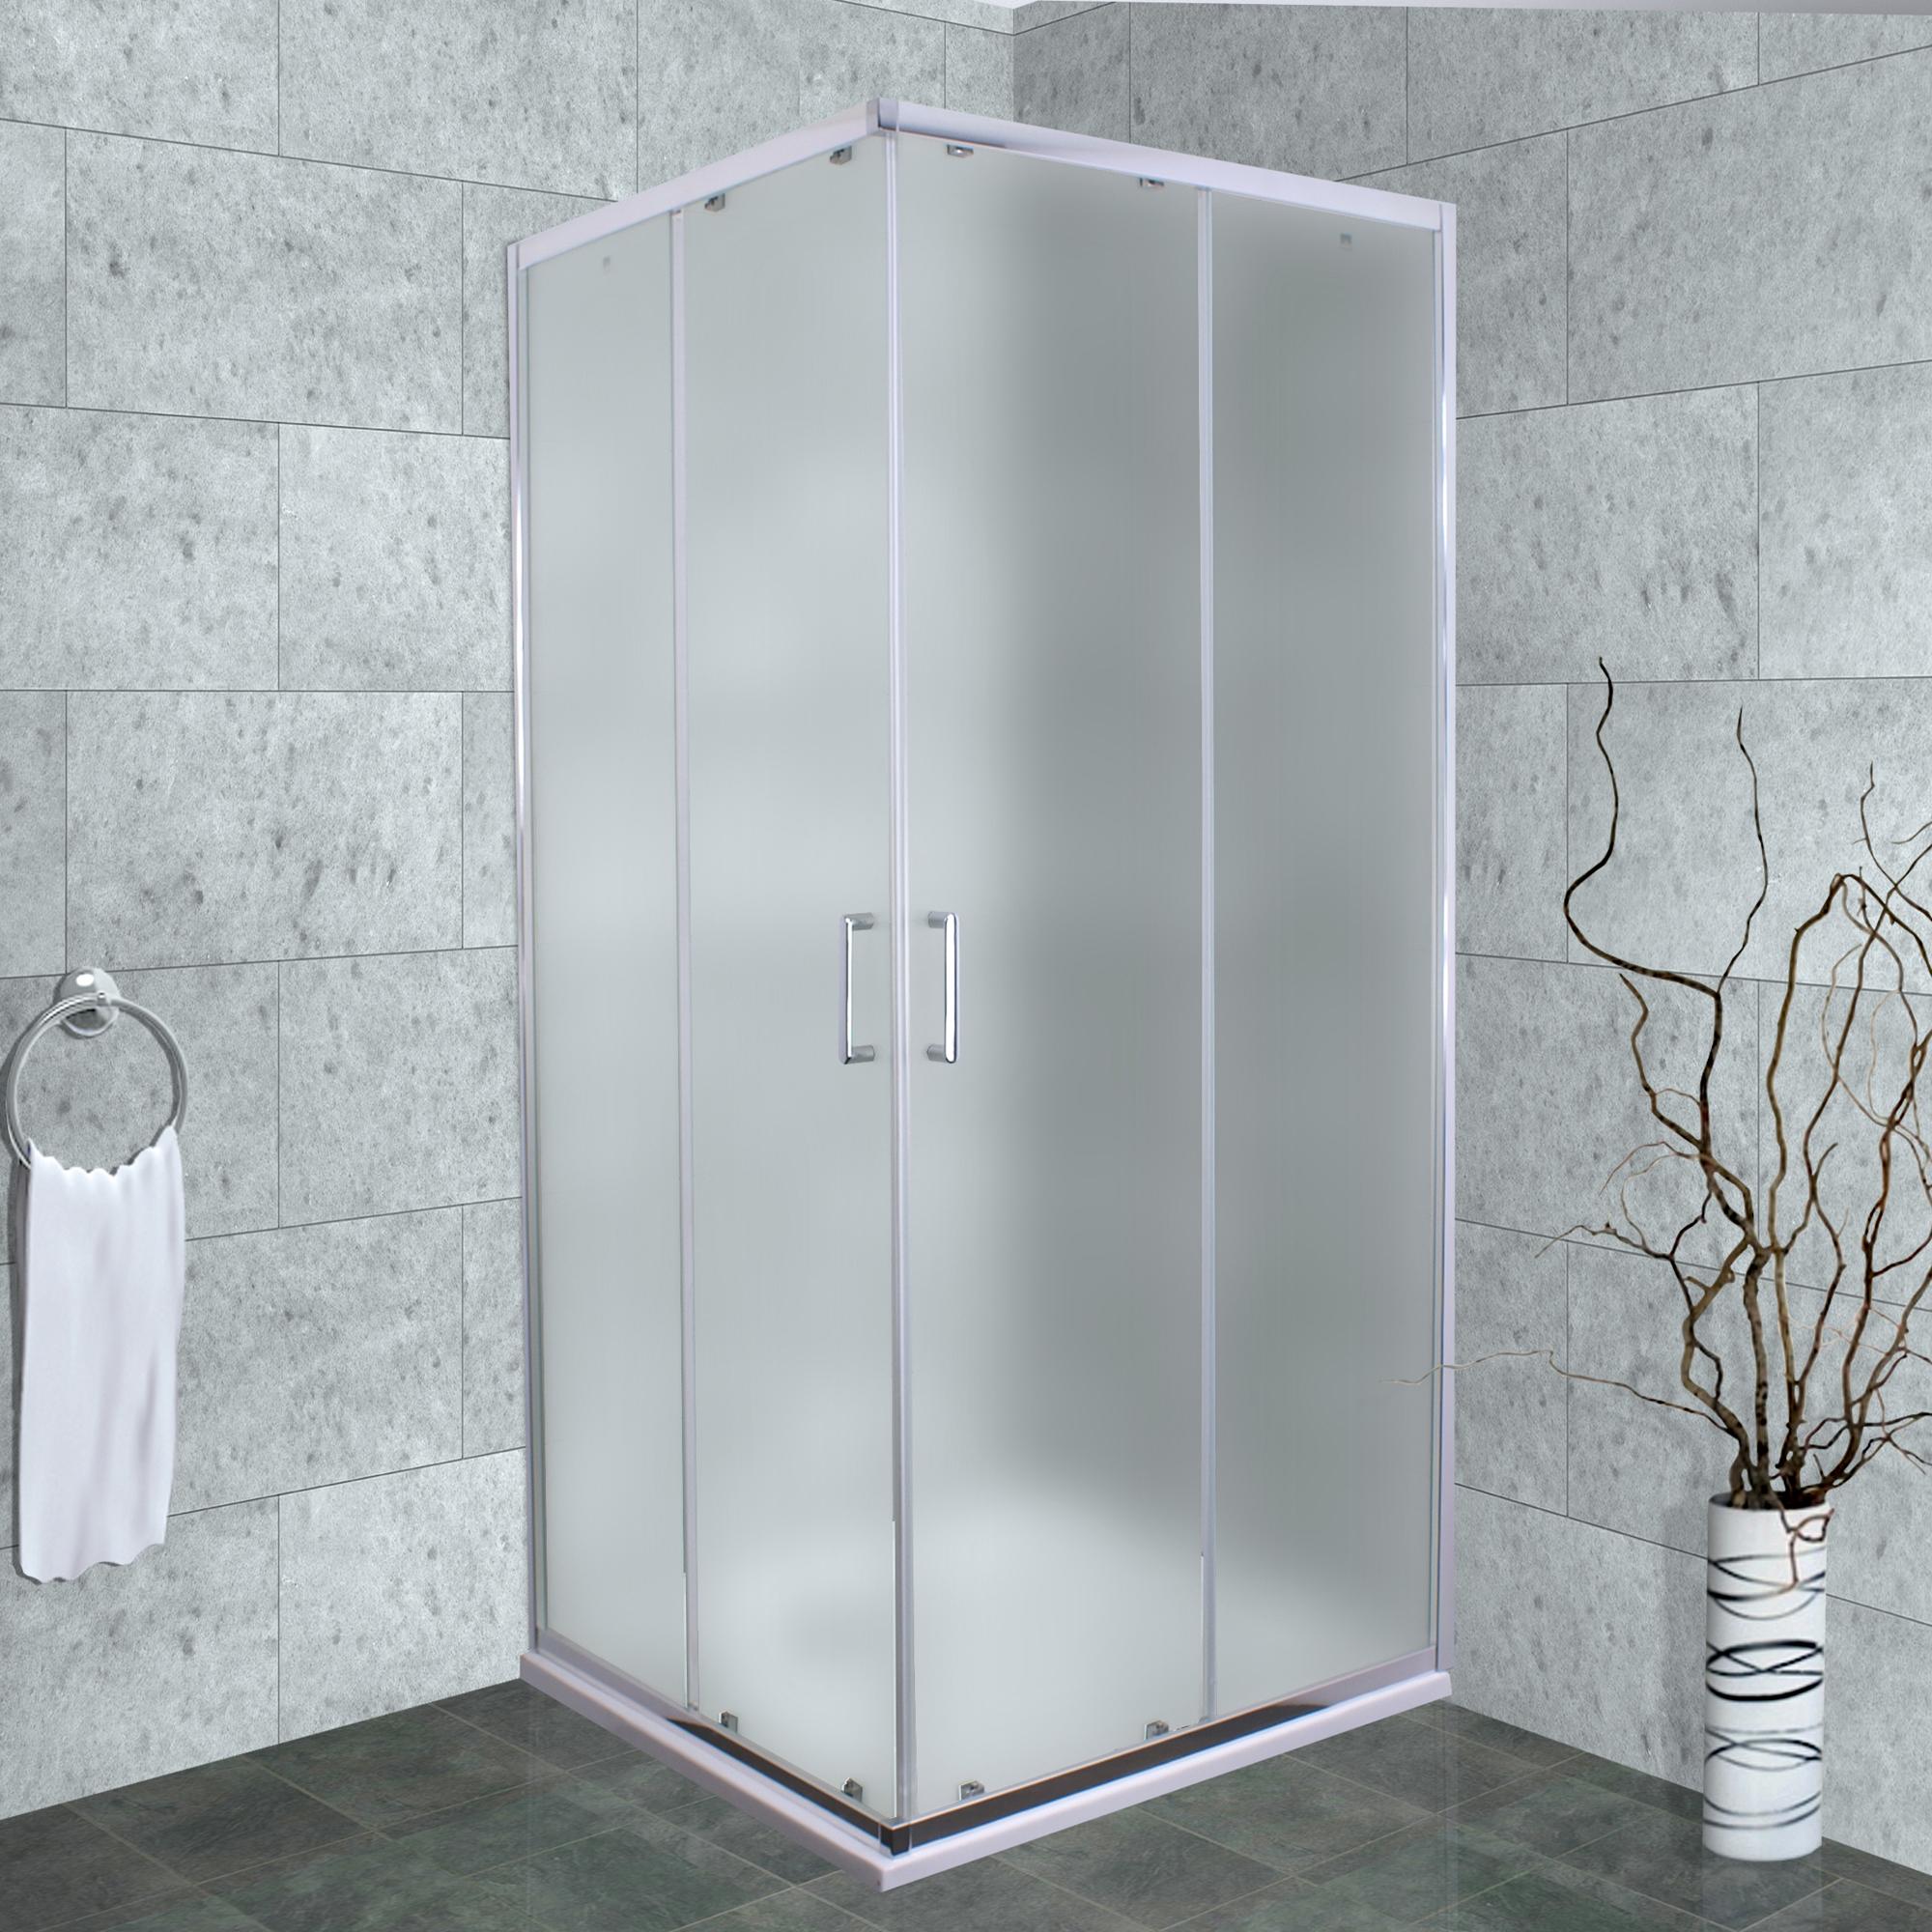 Душевой уголок Timo Altti 618 Foggy Glass без поддона душевой уголок timo altti душевой угол 619 clean glass 90 90 190